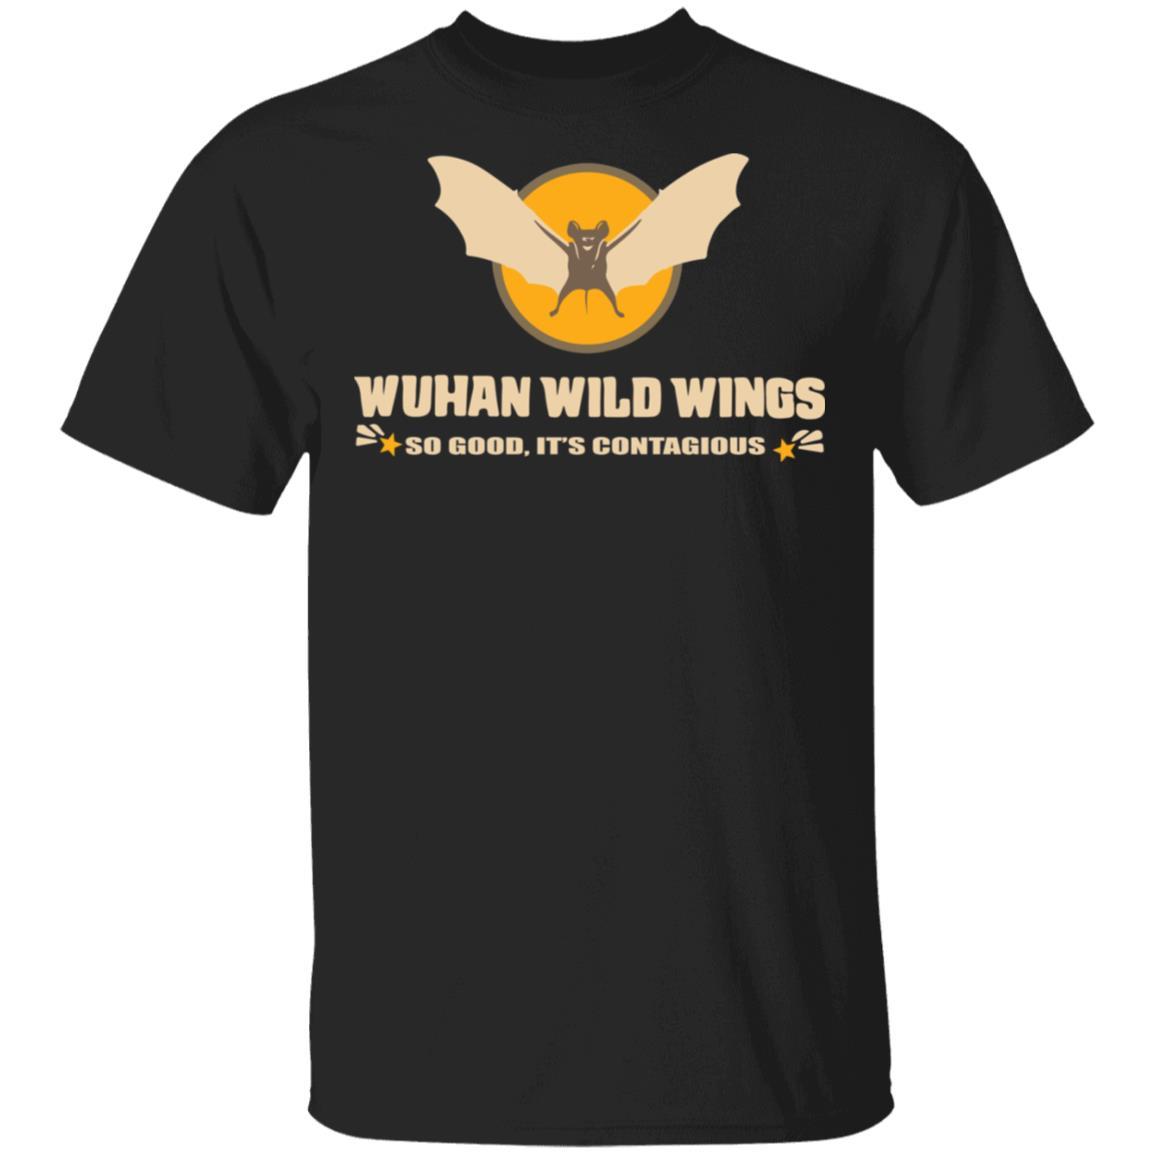 Wuhan wild wings so good It's contagious shirt, hoodie, long sleeve